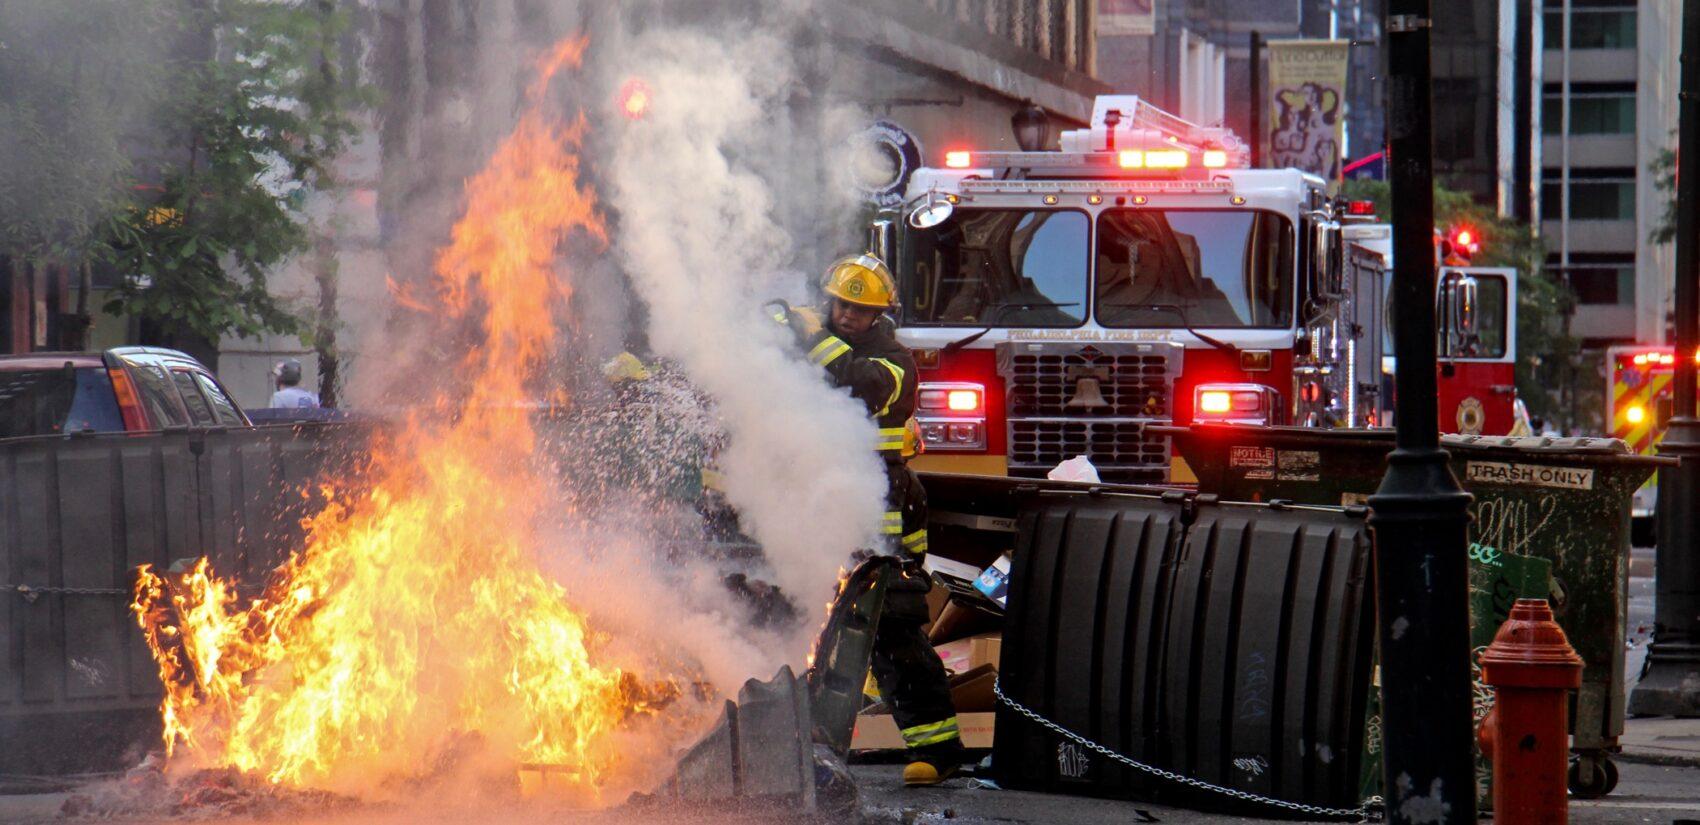 A Philadelphia firefighter puts out a dumpster fire